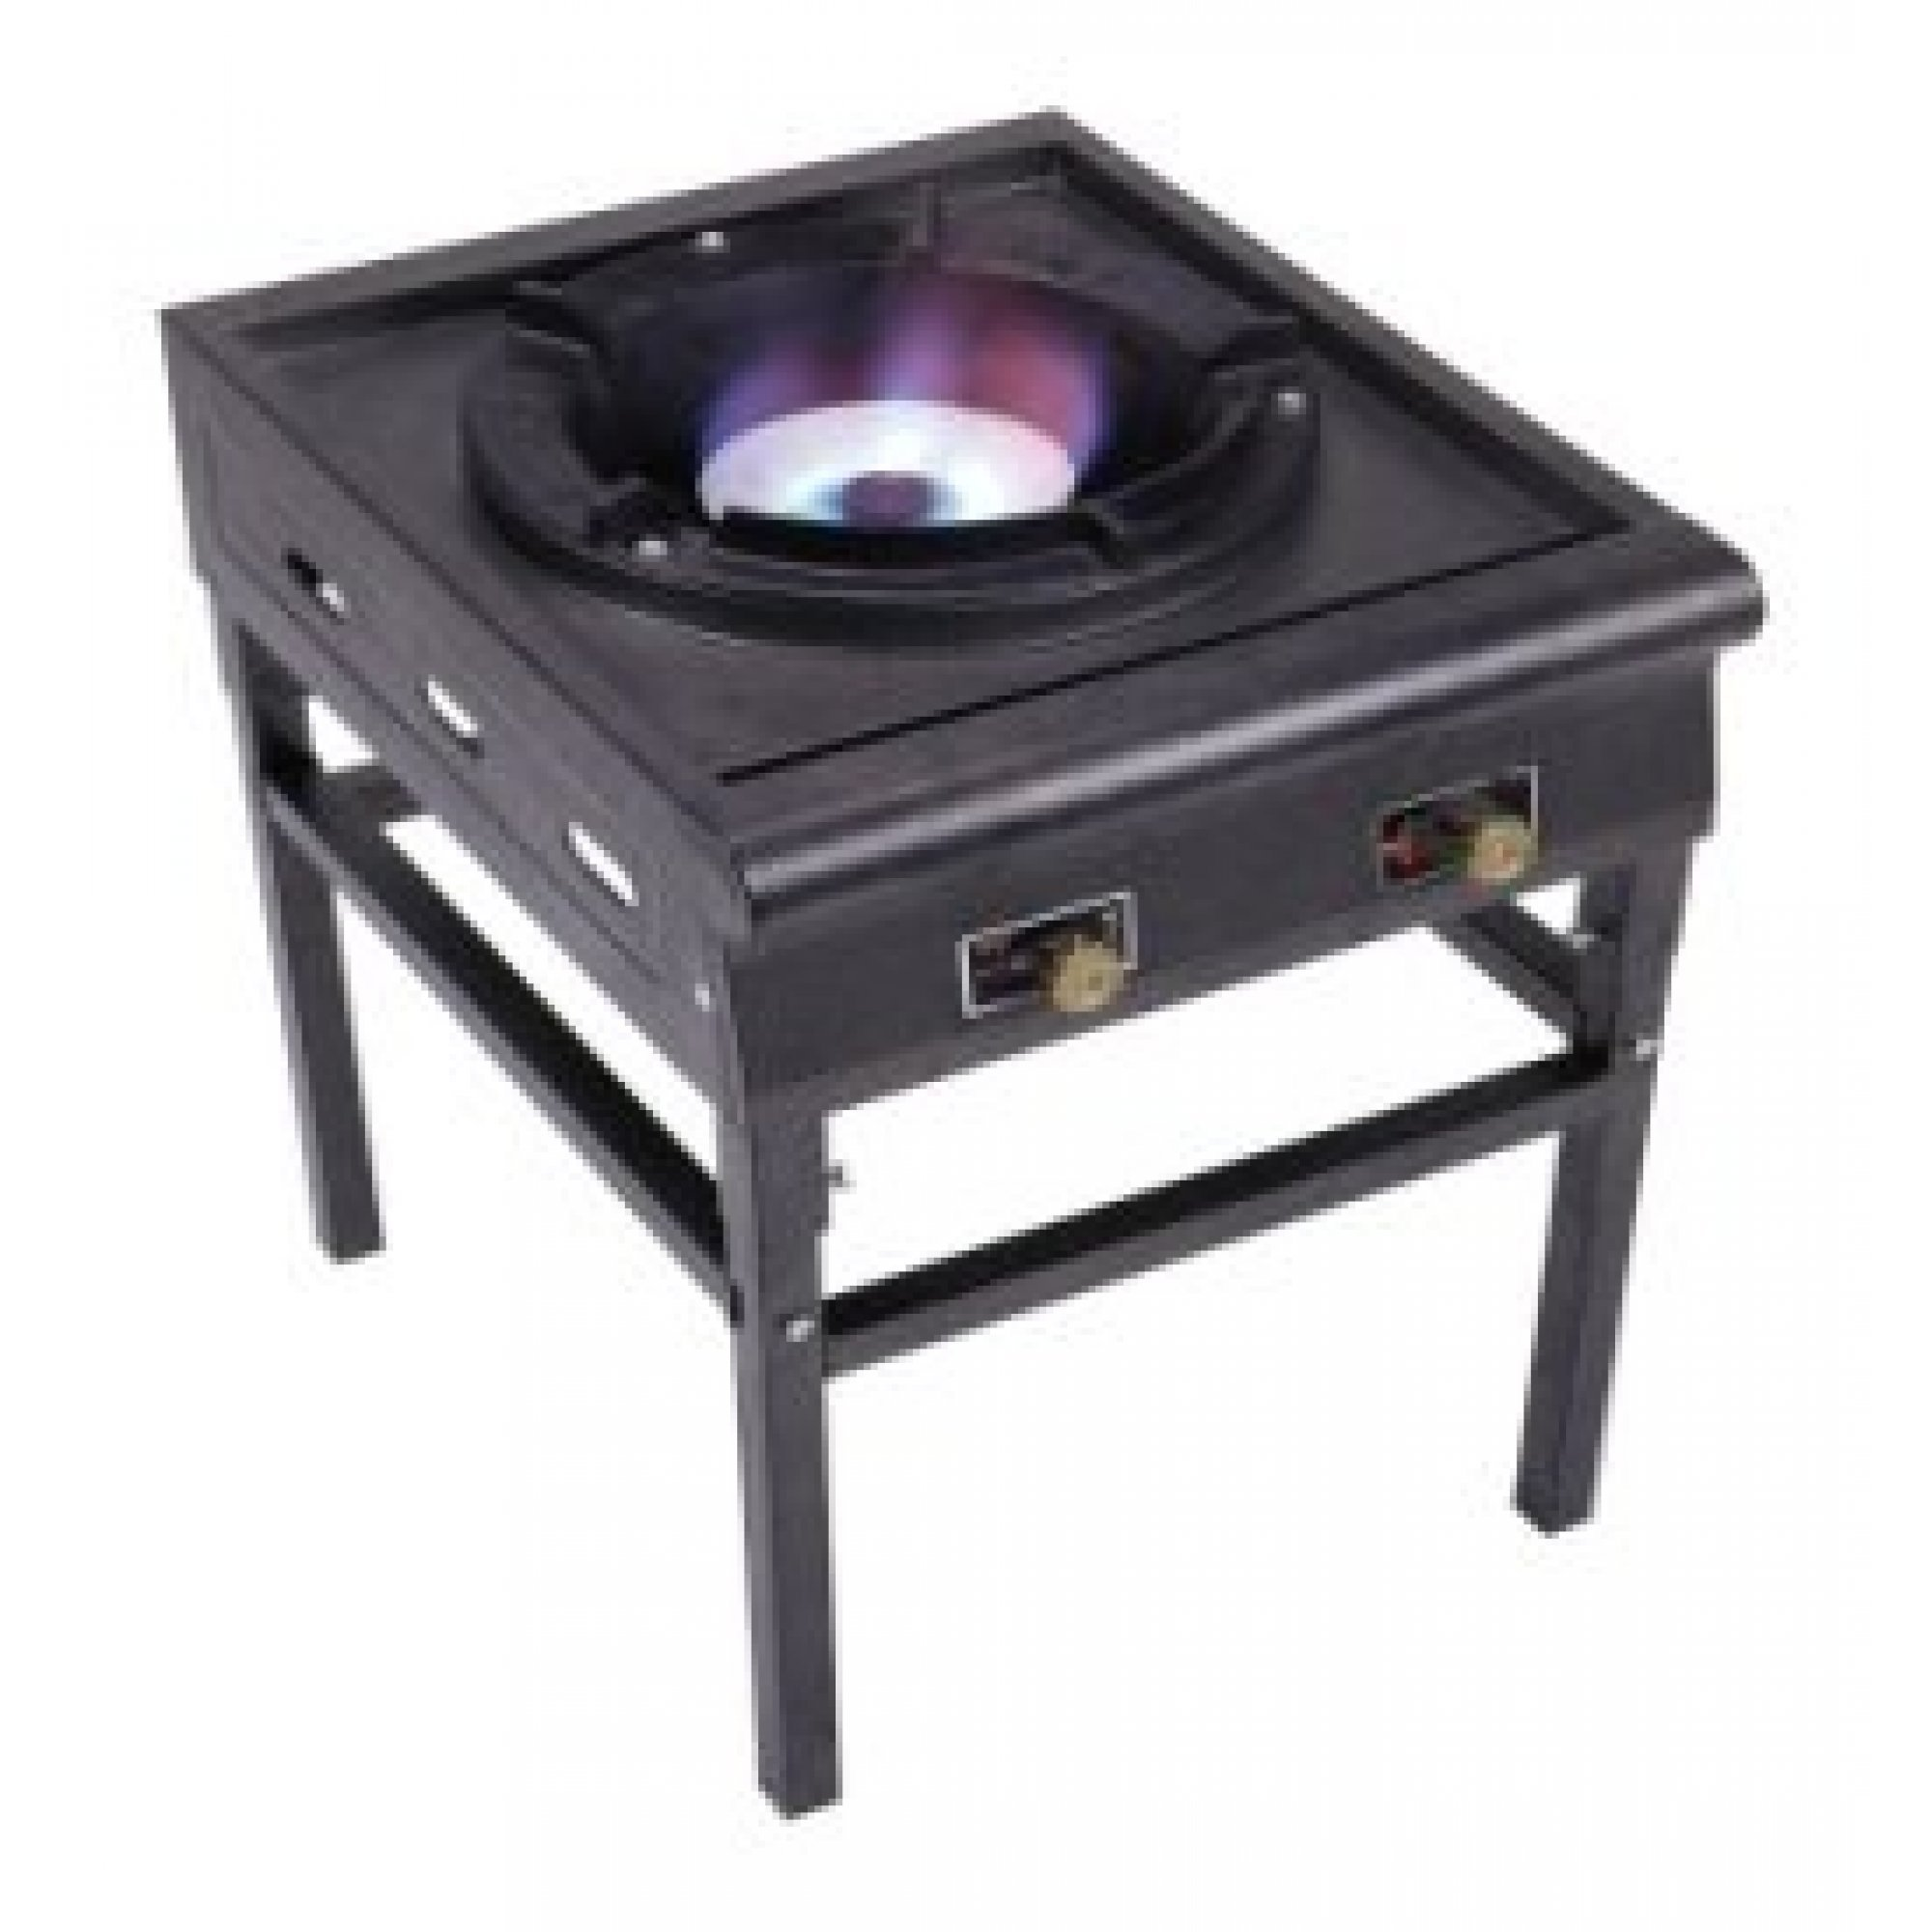 Газовая ВОК плита-горелка 30 кВт, 1 контур.